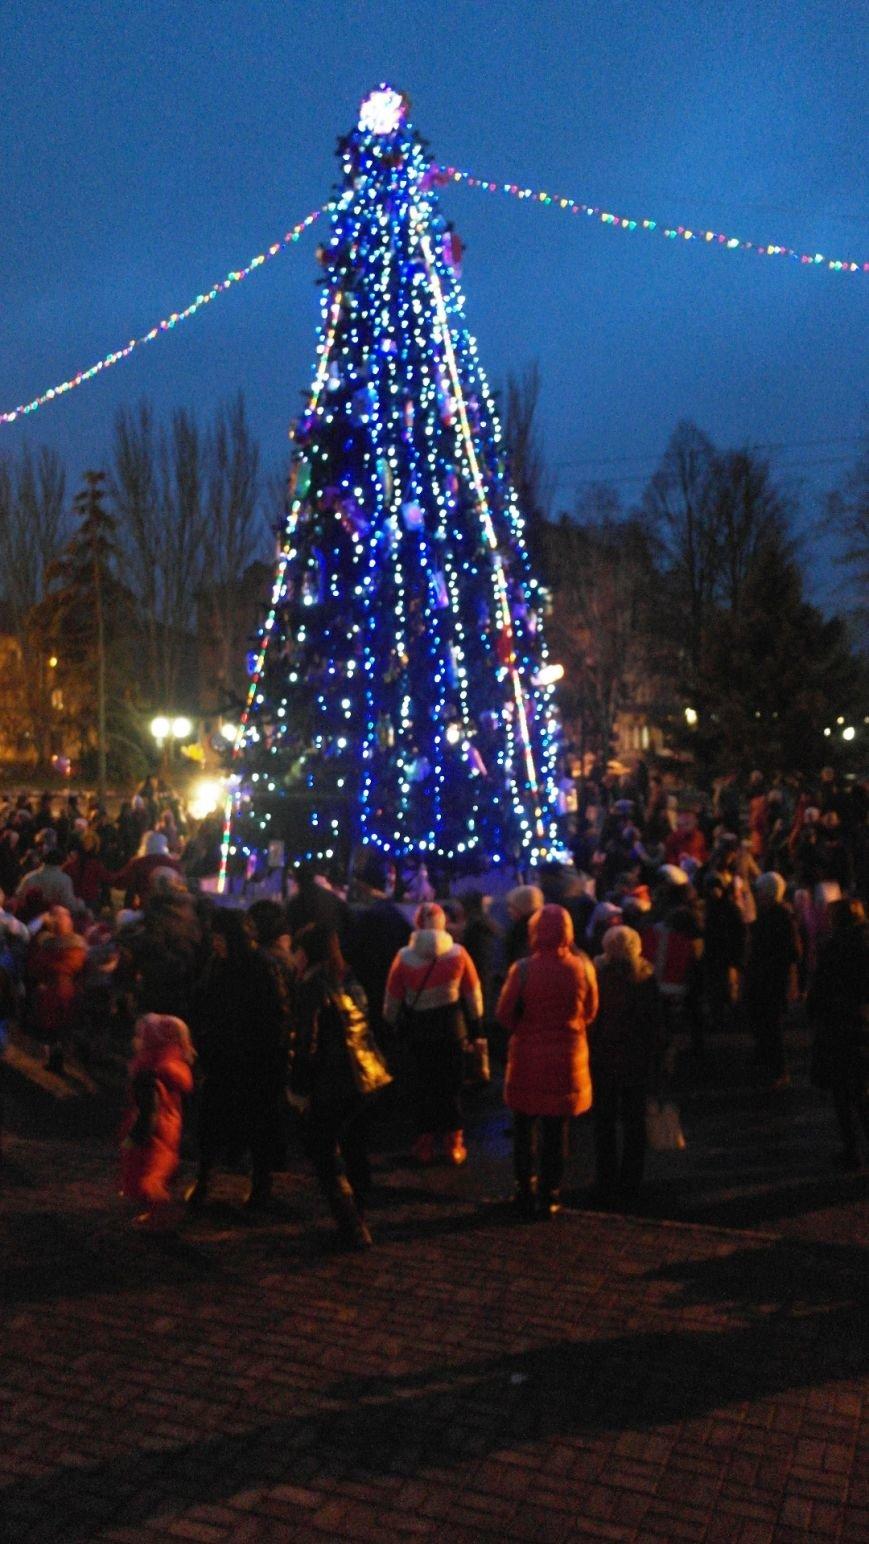 «Раз, два, три…» В Красноармейске «зажглась» Новогодняя елка, фото-24